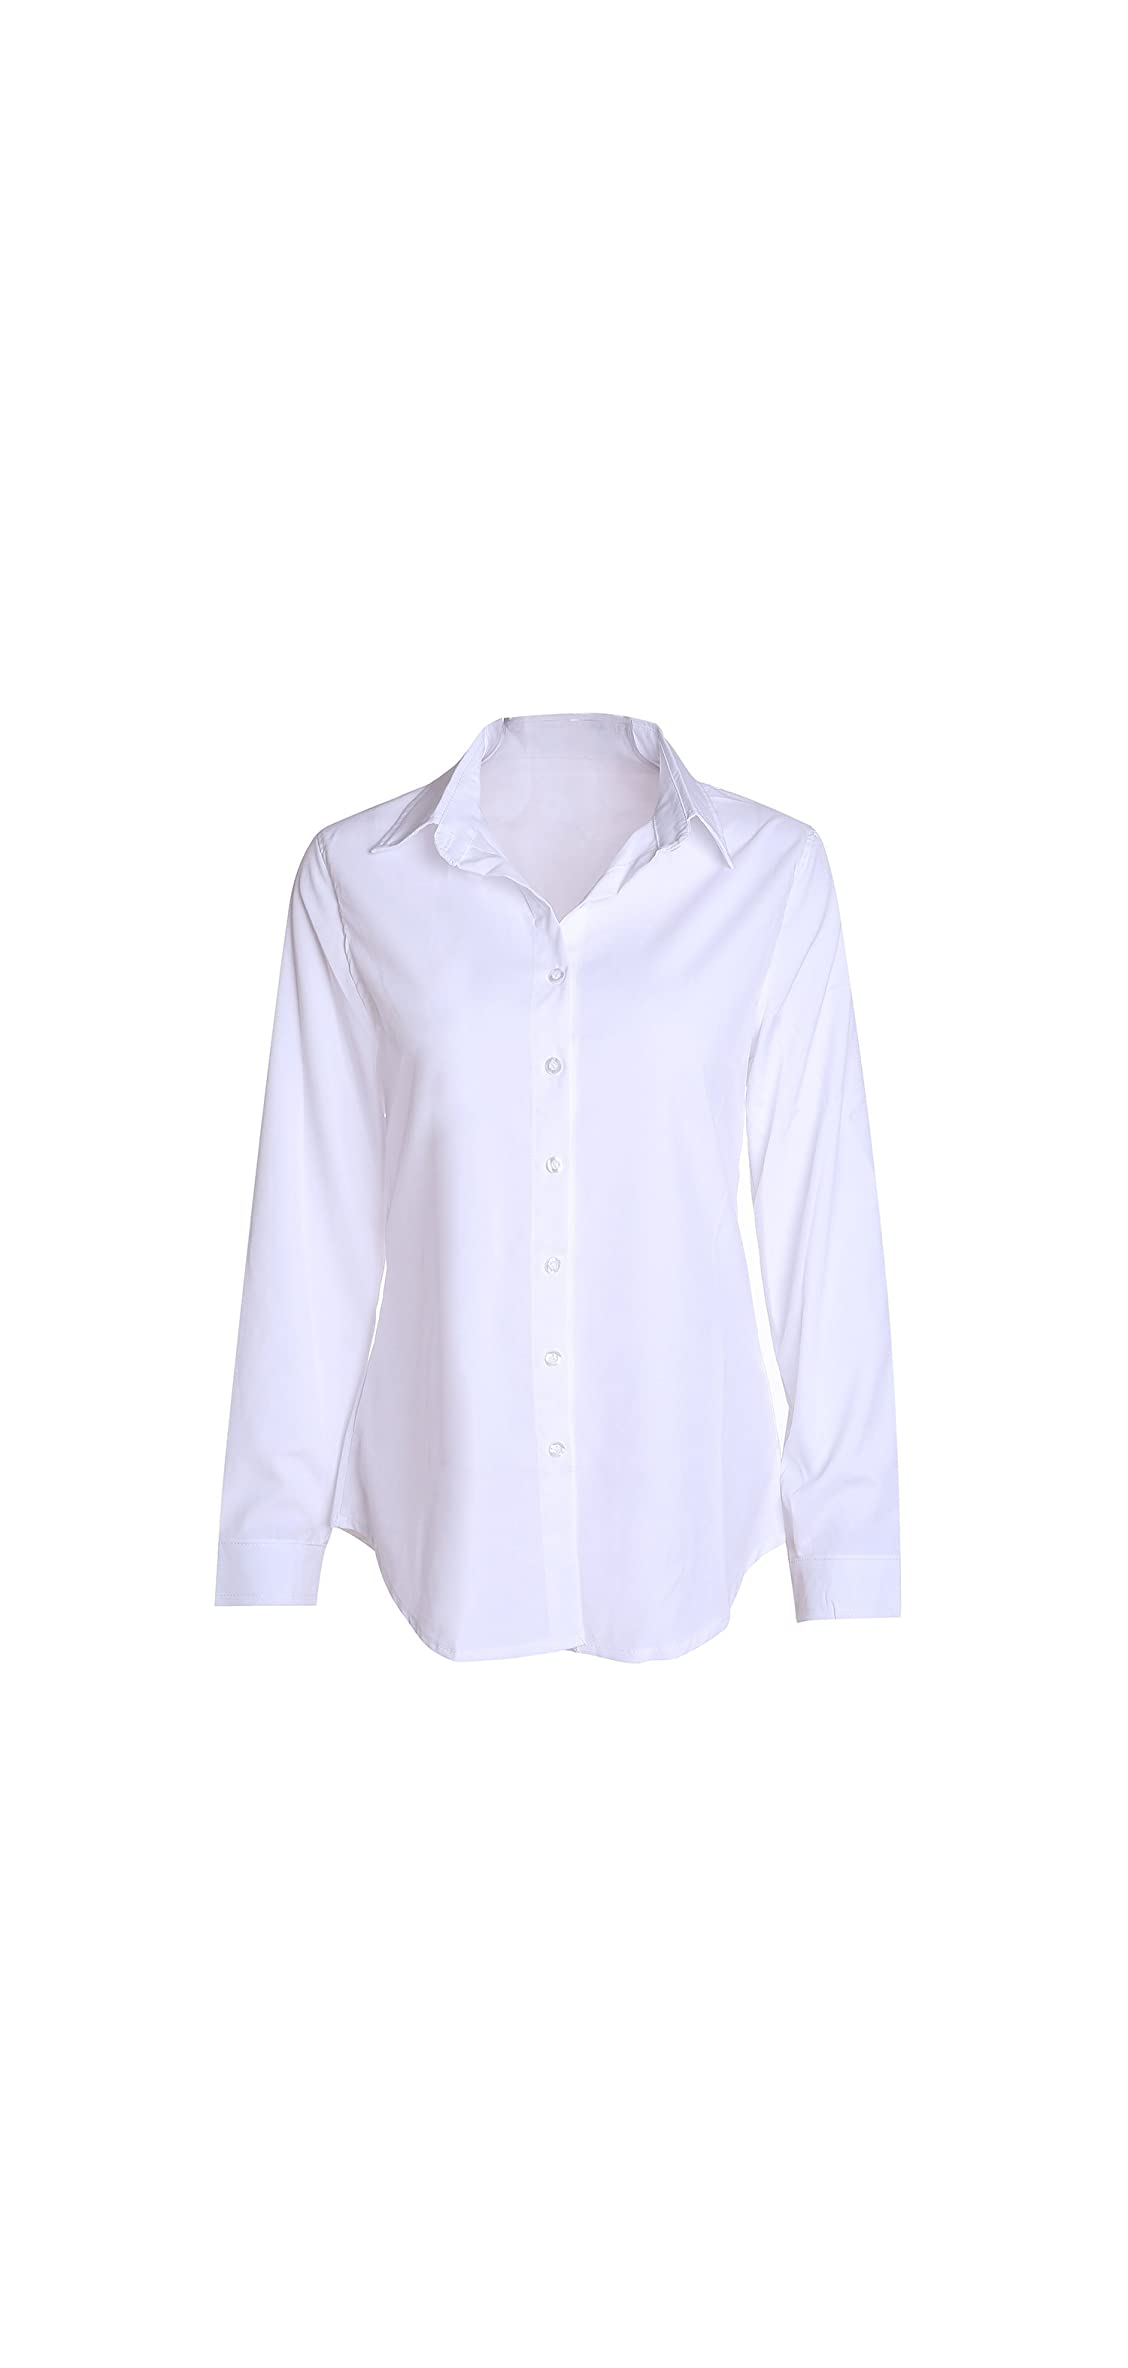 Women Slim Shirt V Neck Long Sleeve Collared Button-down